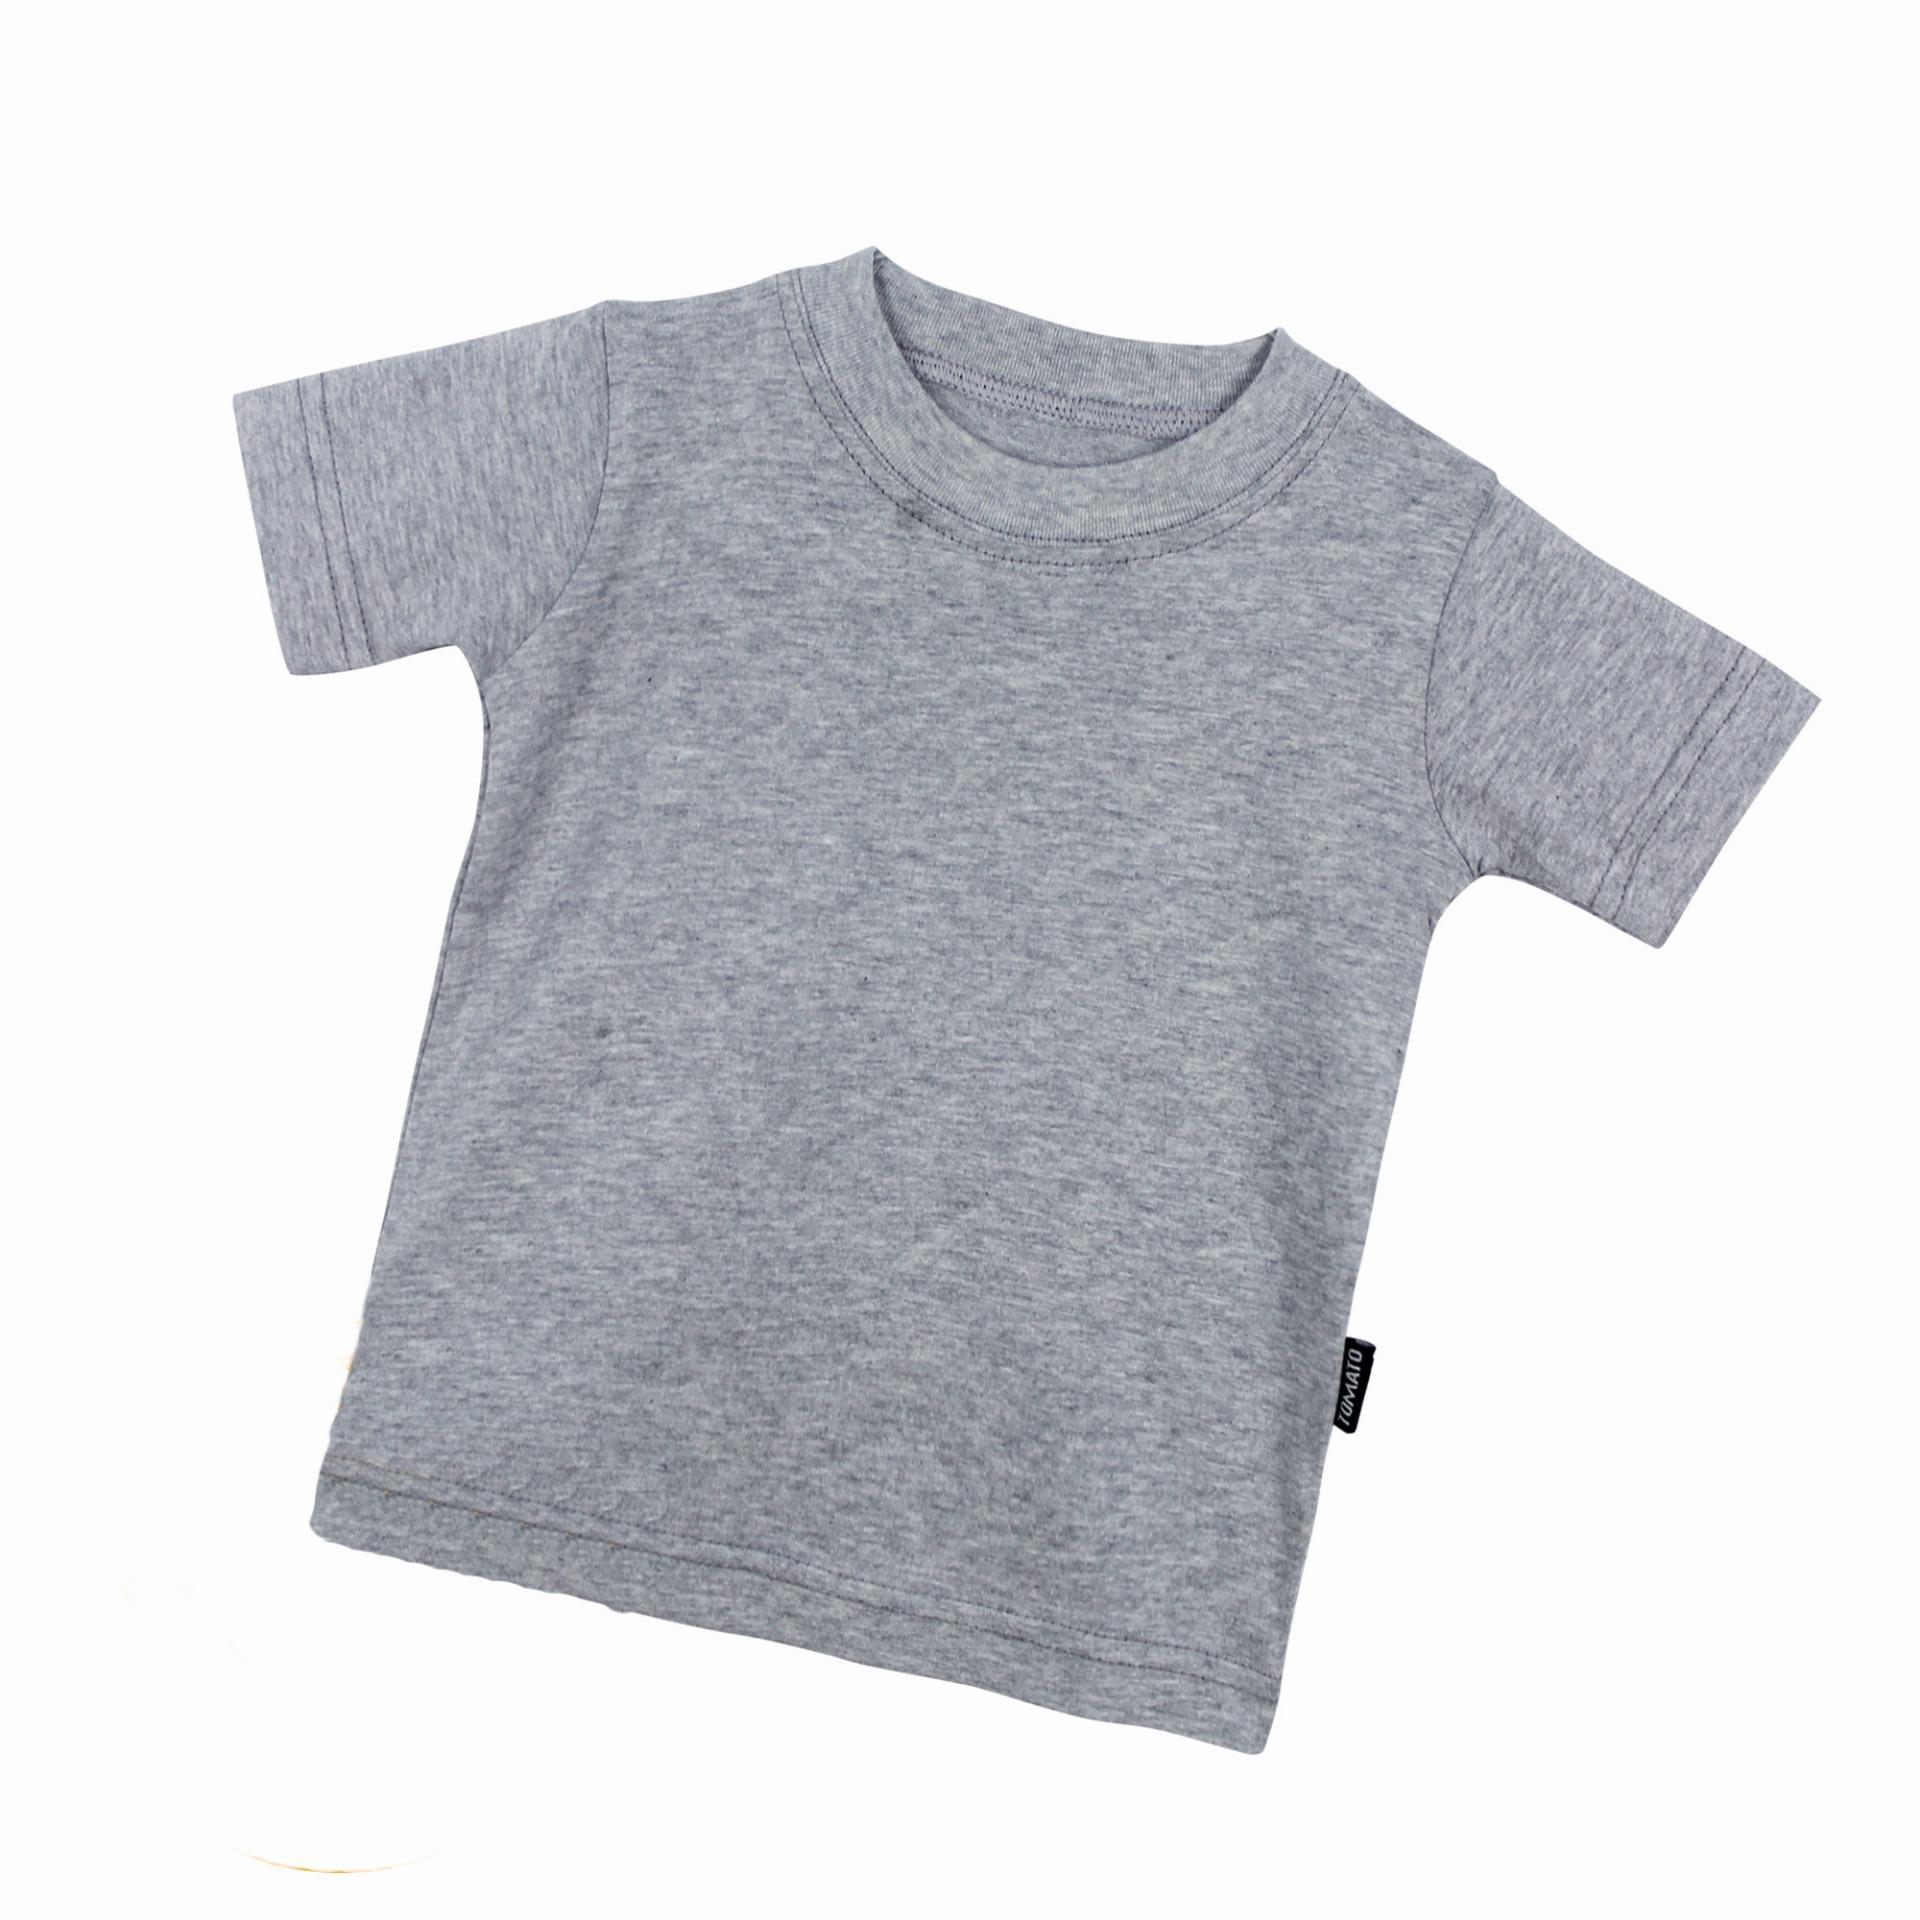 Jual Produk Kaus Polos Bayi Laki Murah Daftar Harga Kaos Polo Anak Tomato Clothing 6 12 Bulan 1 Tahun